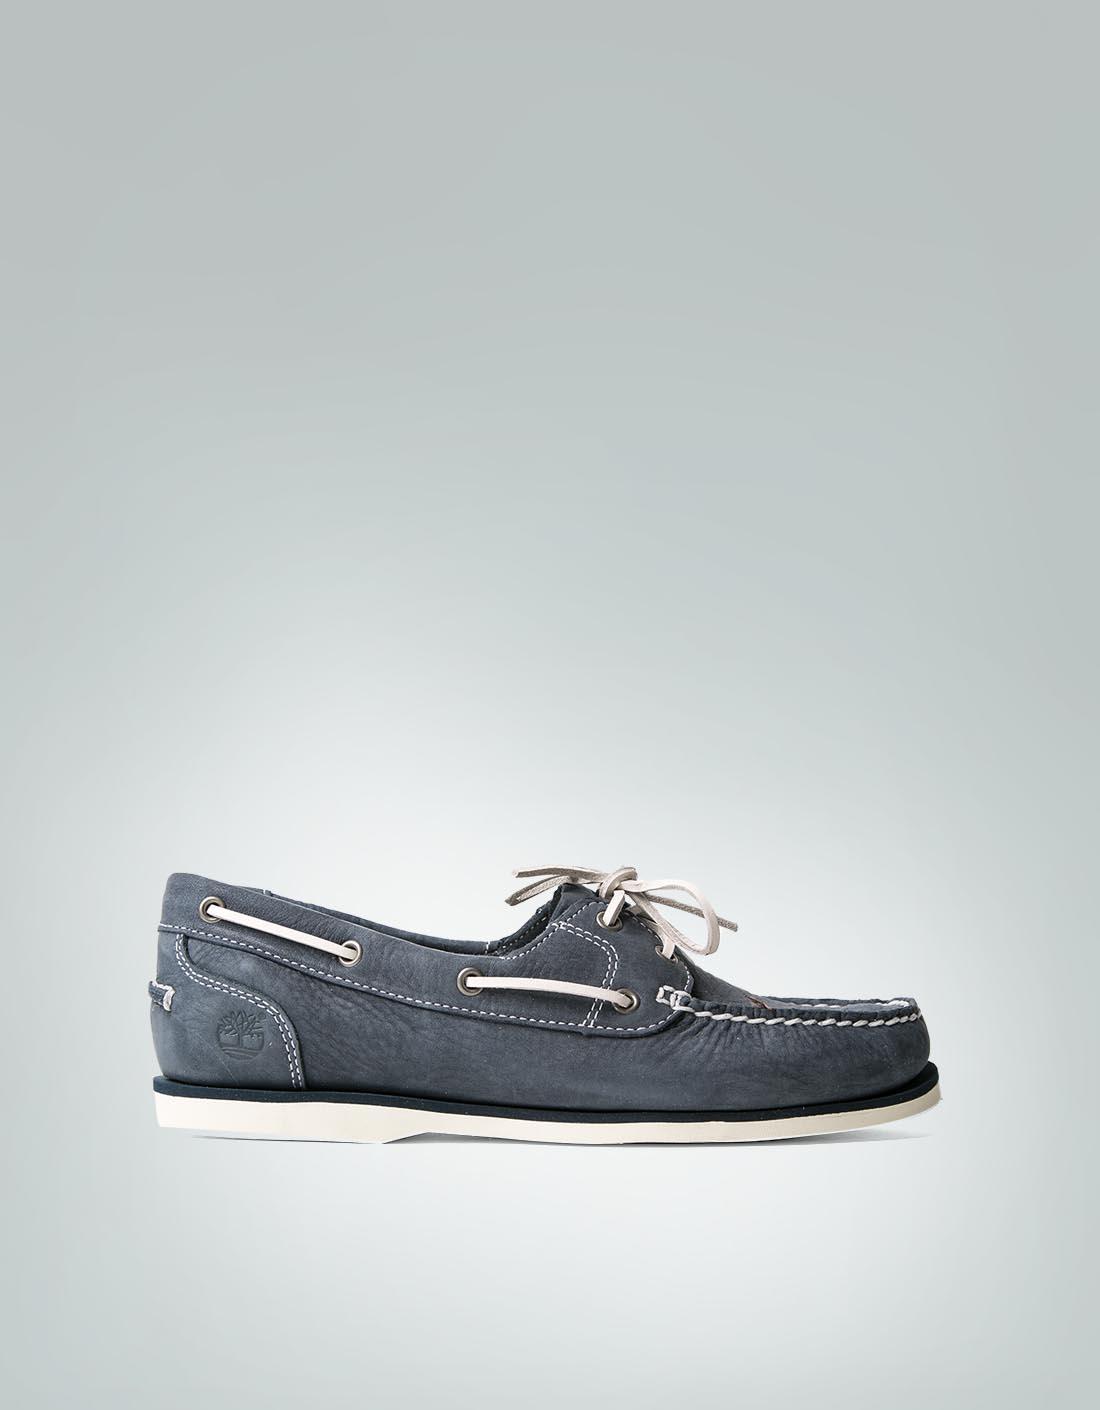 size 40 c0af2 1987f Timberland Damen Schuhe blau Mokassin aus Nubukleder ...